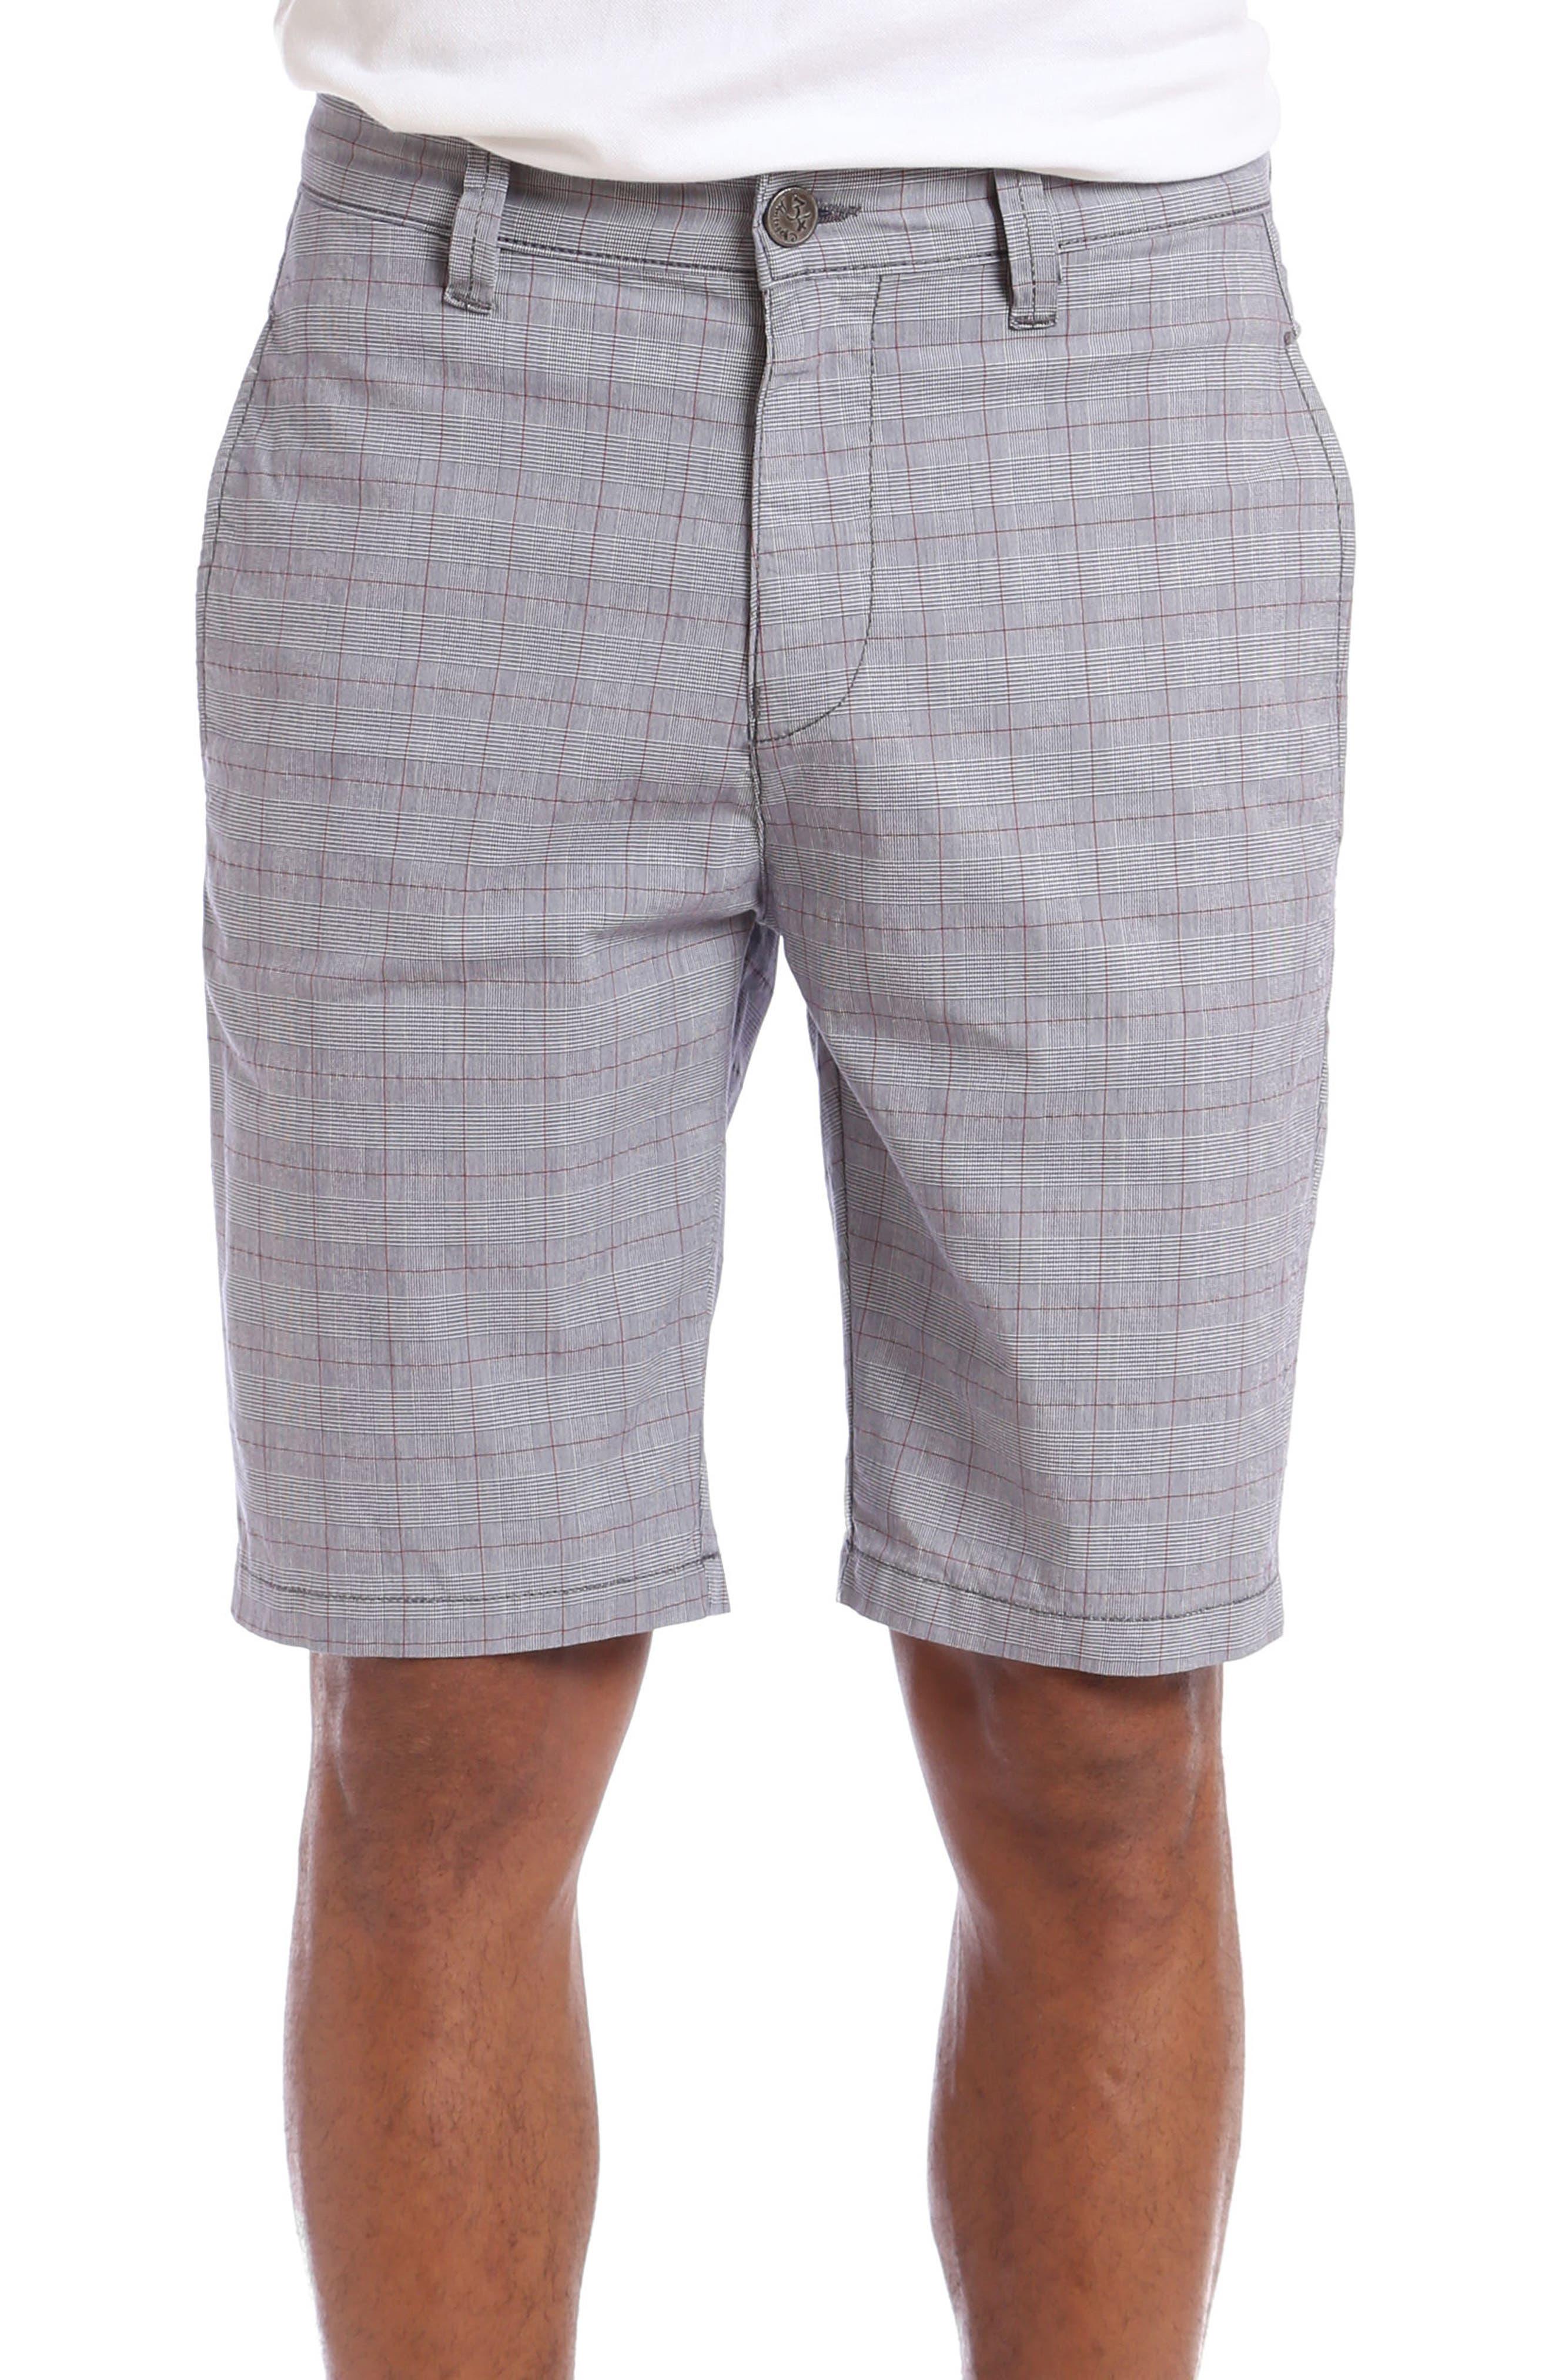 34 HERITAGE,                             Nevada Twill Shorts,                             Main thumbnail 1, color,                             020